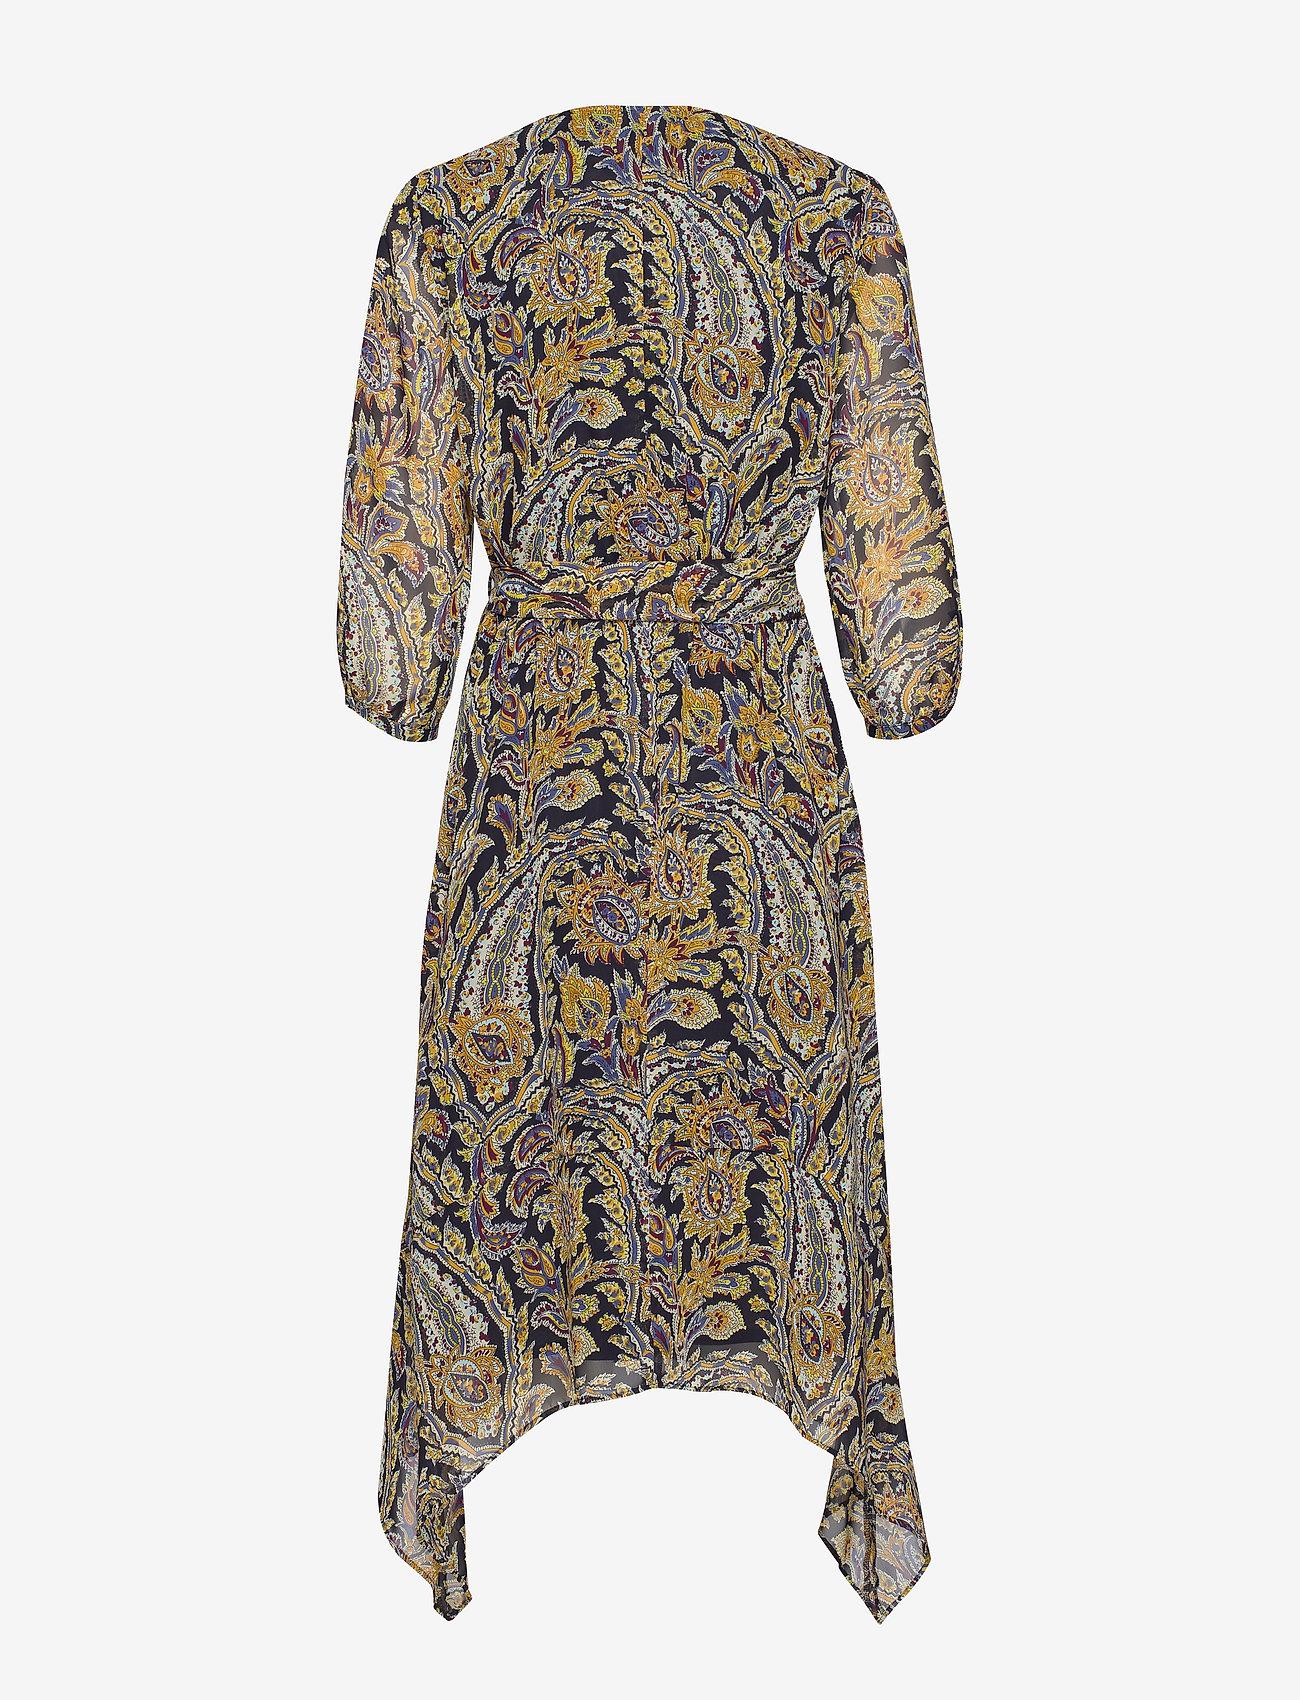 Dress Woven Fabric (Blue Multicolor Print) (1049.40 kr) - Gerry Weber